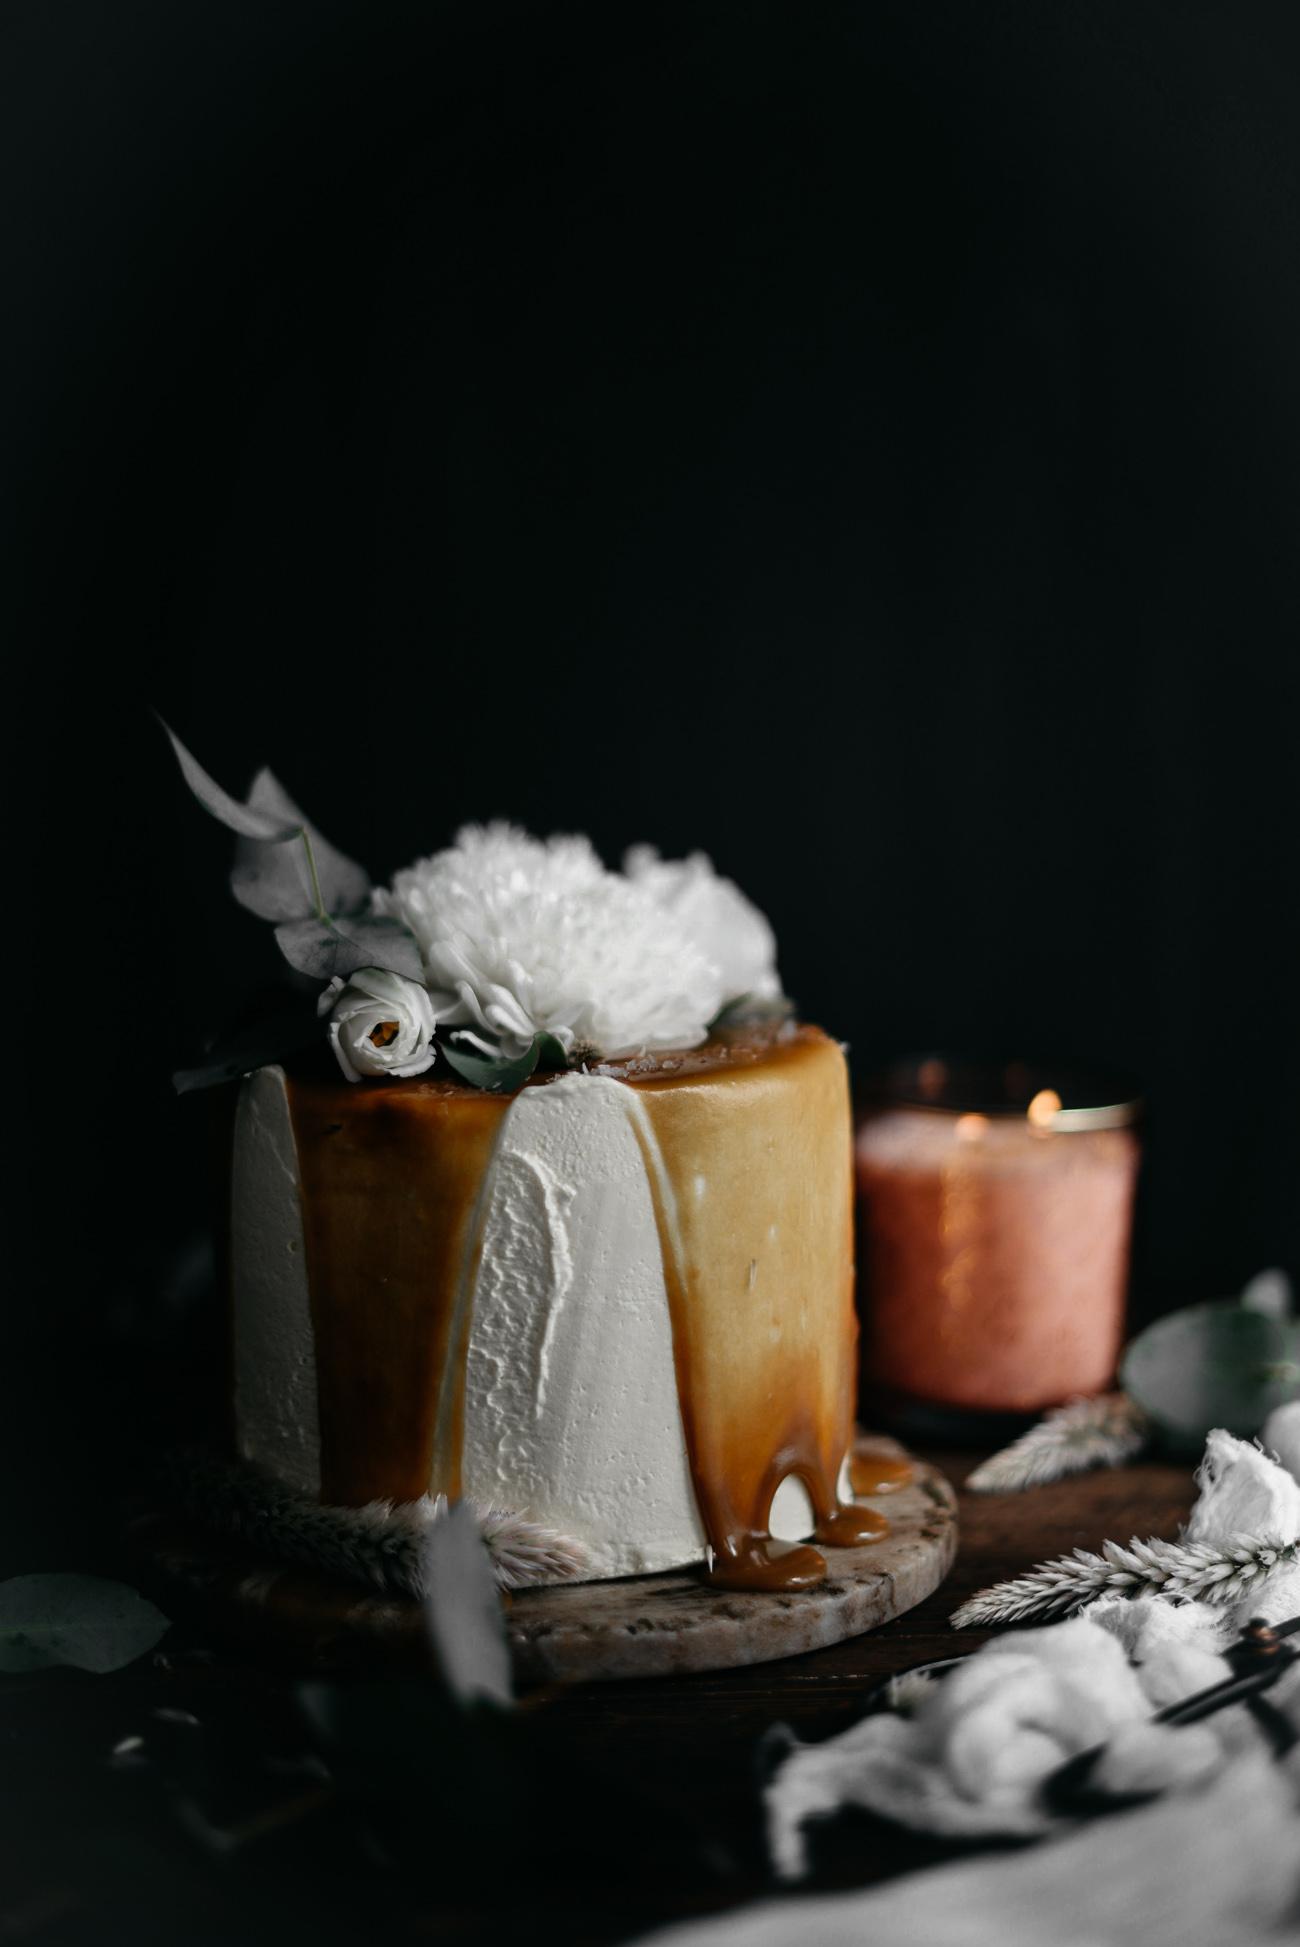 Italian-Orange-Blossom-and-Almond-Cake-with-Orange-Curd-Mascarpone-Swiss-Meringue-Buttercream-and-Fleur-d'Oranger-Caramel-15.jpg